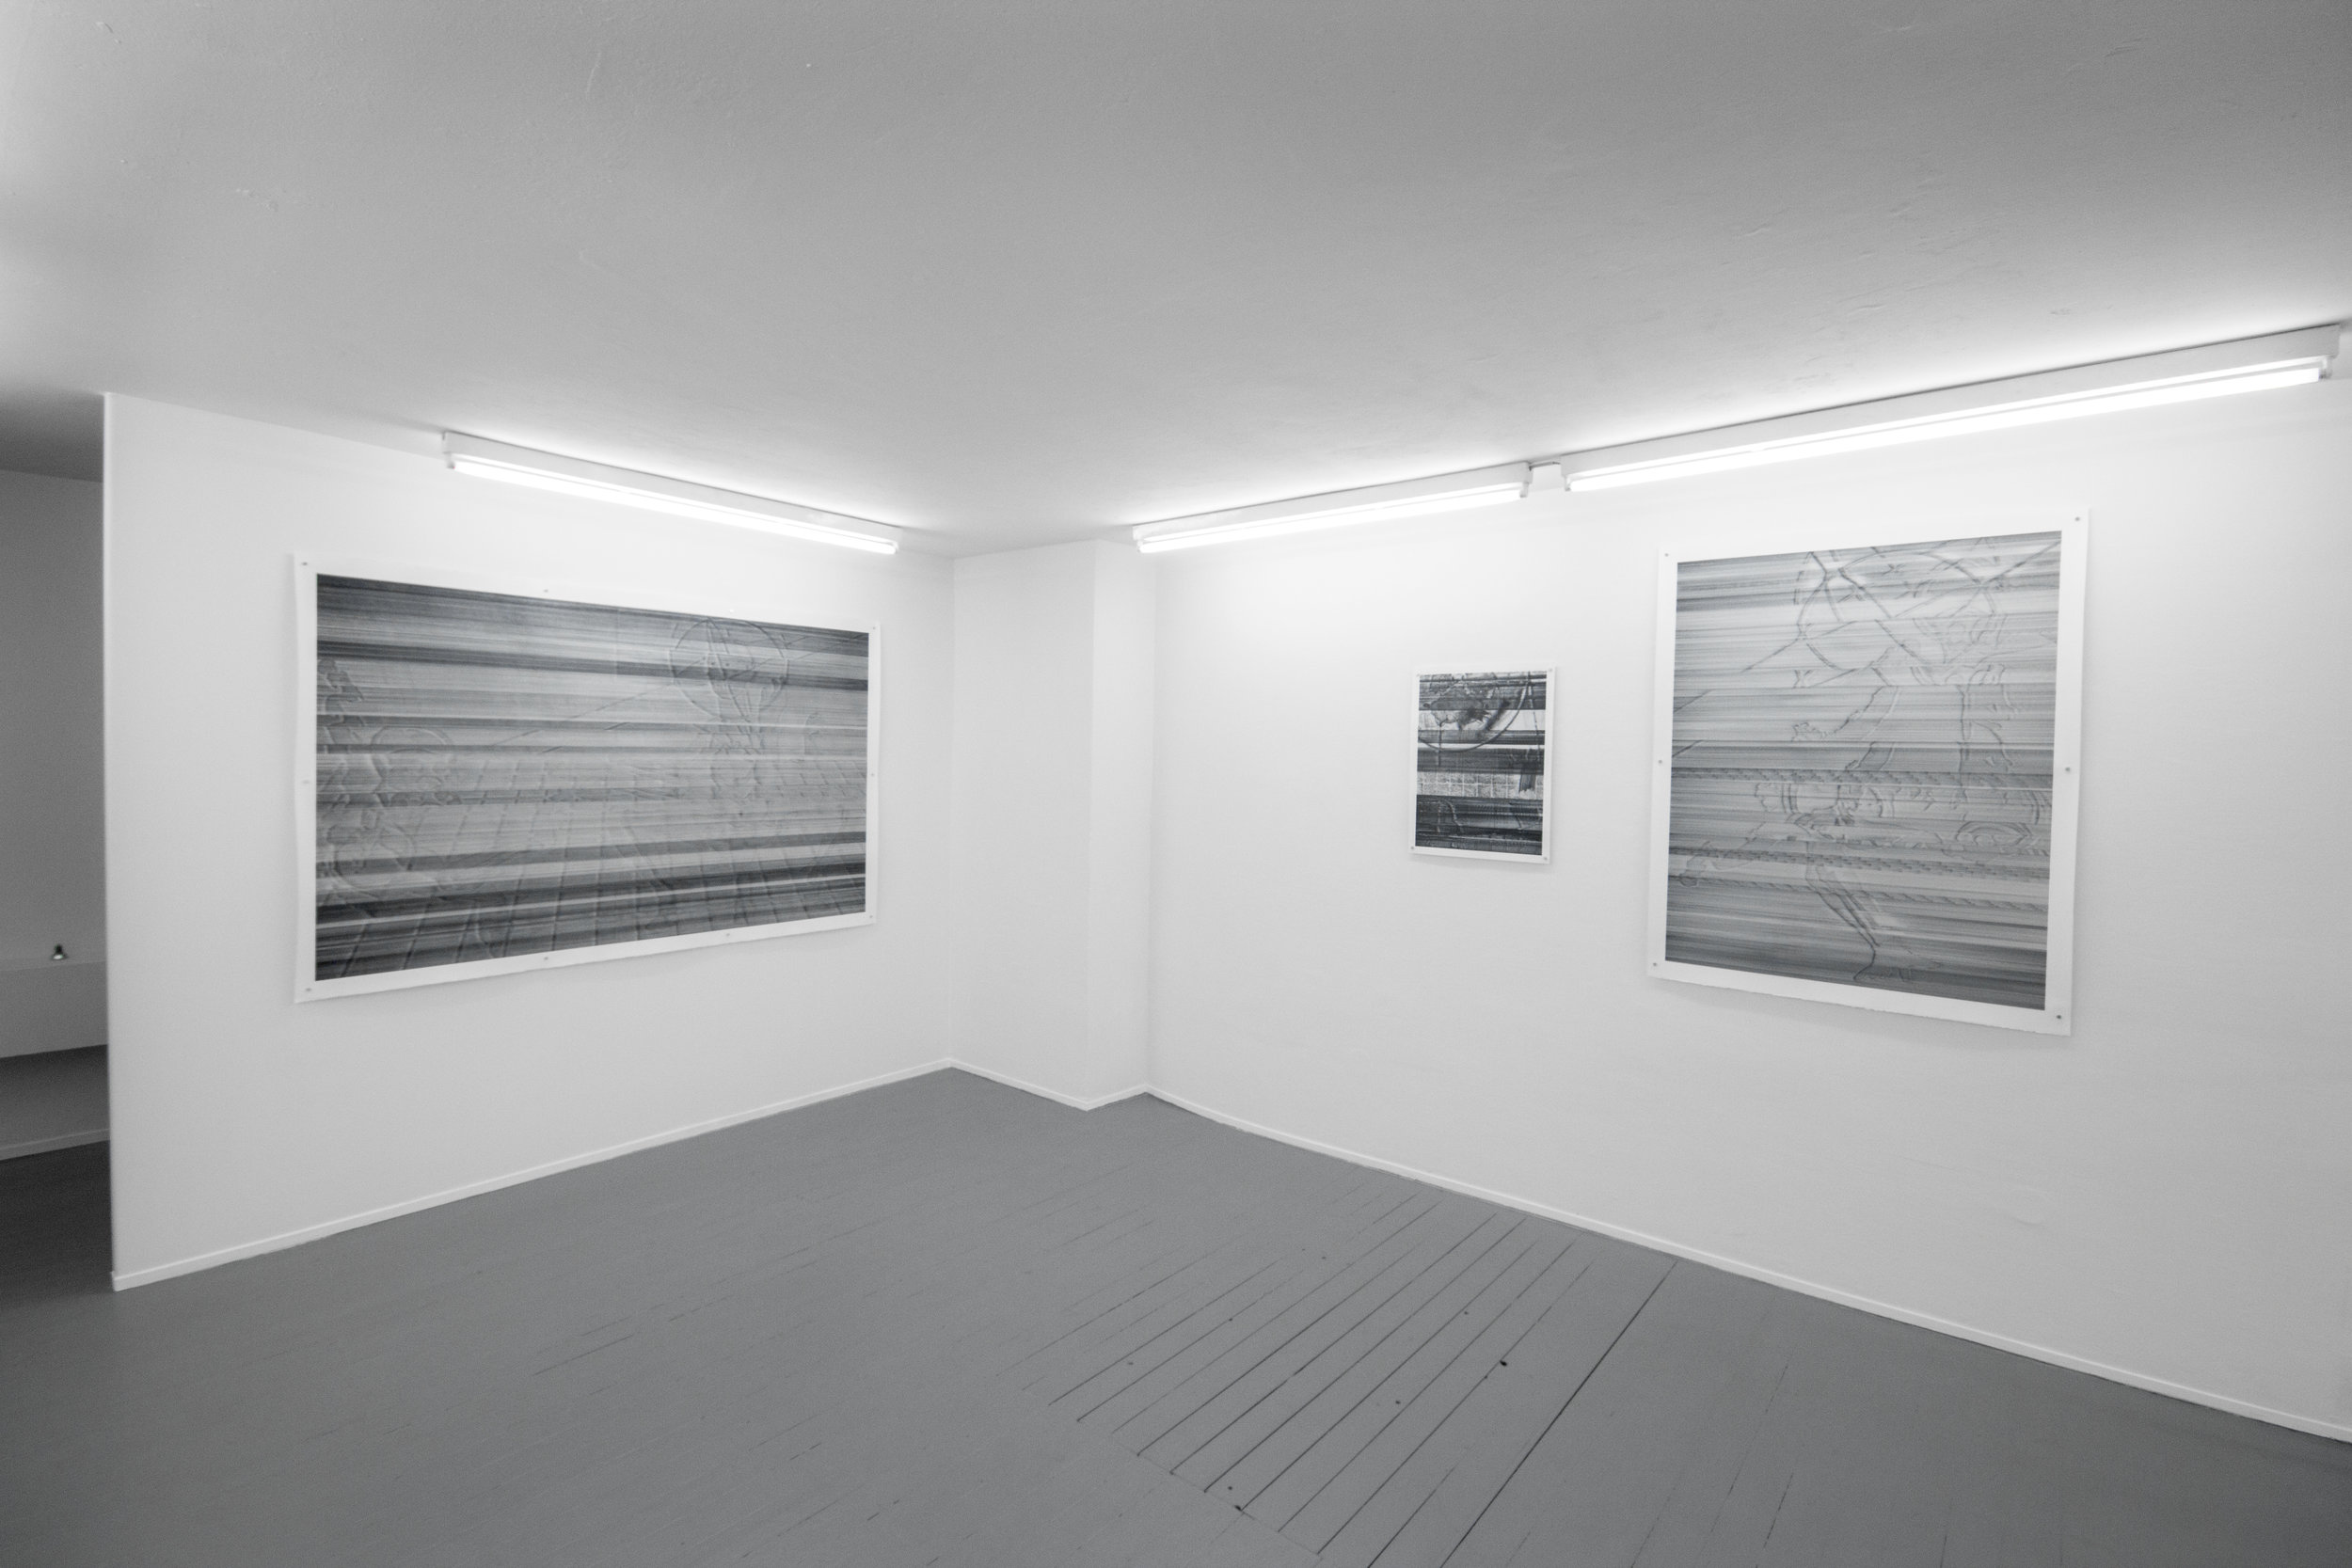 MALFUNCTIONAL INCUBATOR, 2017, (m) IMPLANTATION MALFUNCTION, 2017; (r) UNINTENTIONAL IMITATION, 2017; Exhibition view, Galerie Kai Erdmann